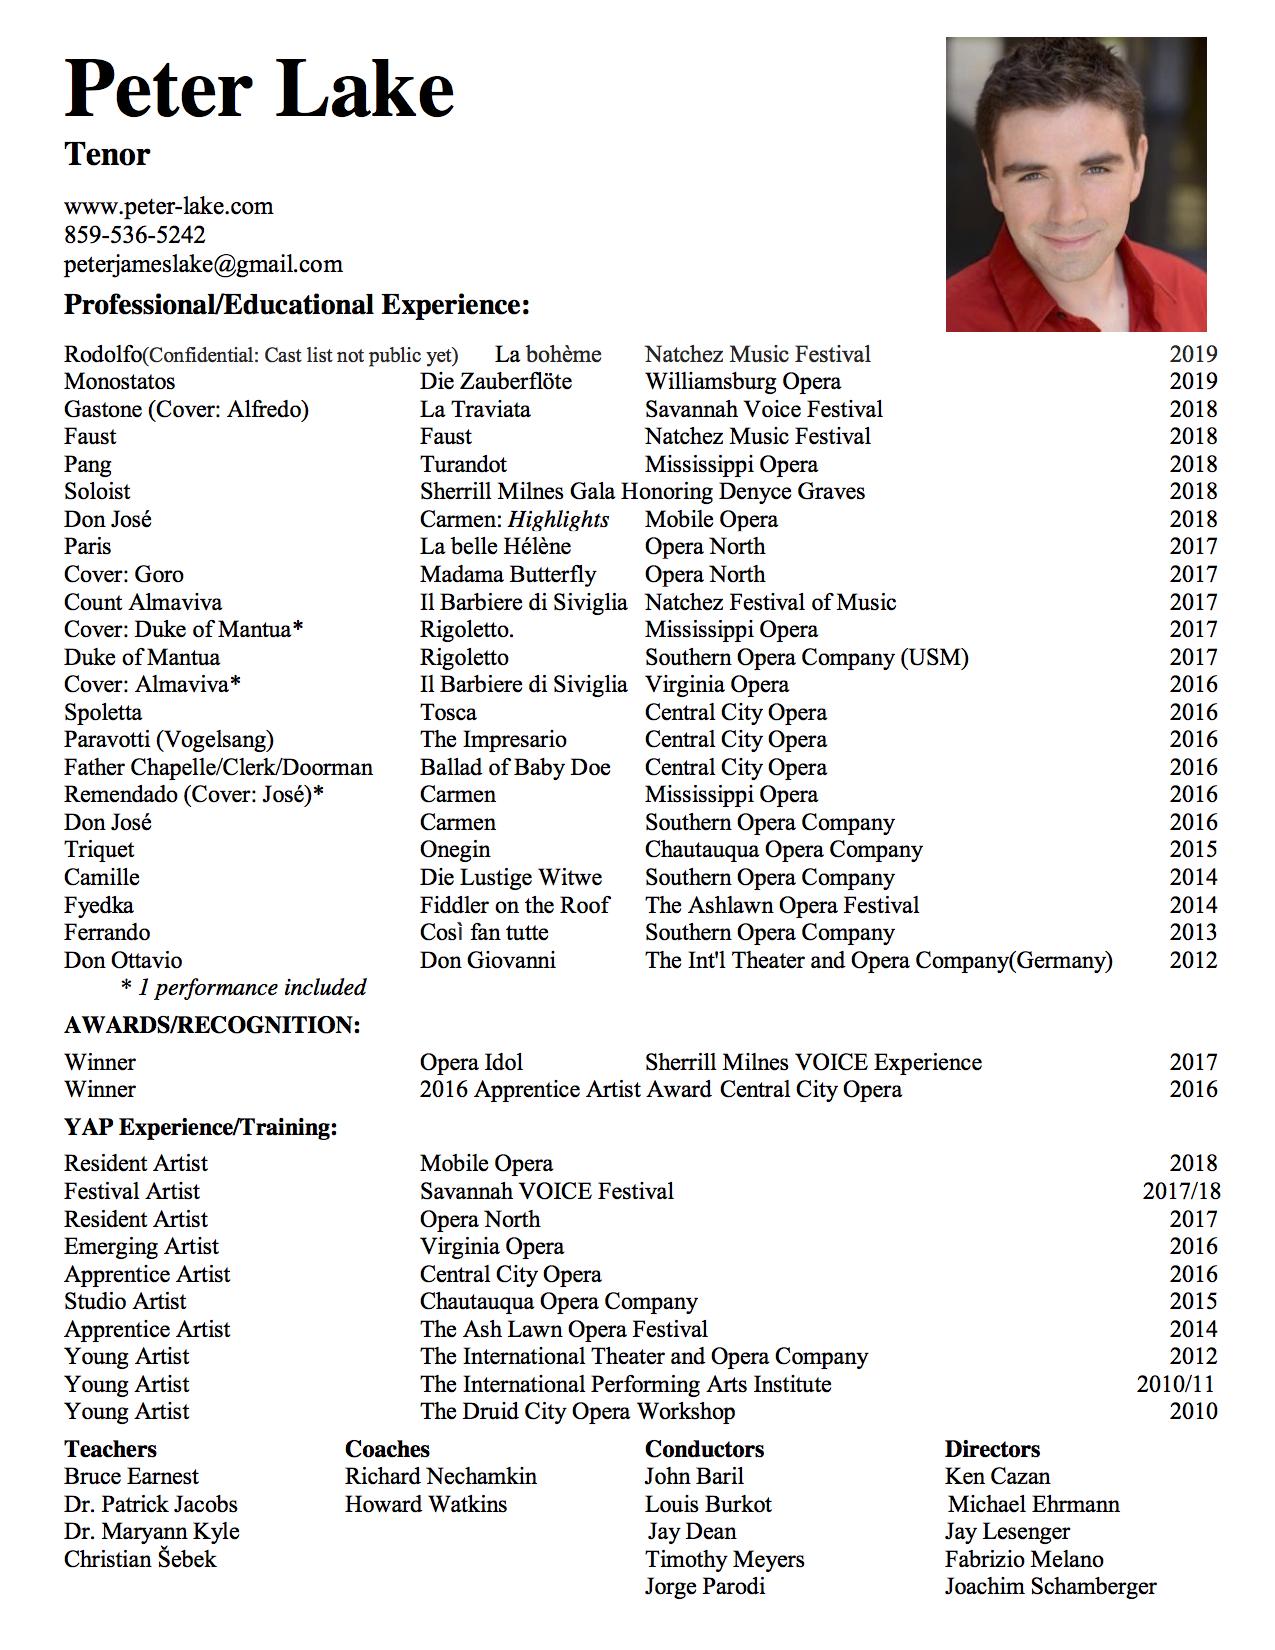 Peter Lake Resume 2018 copy.jpg